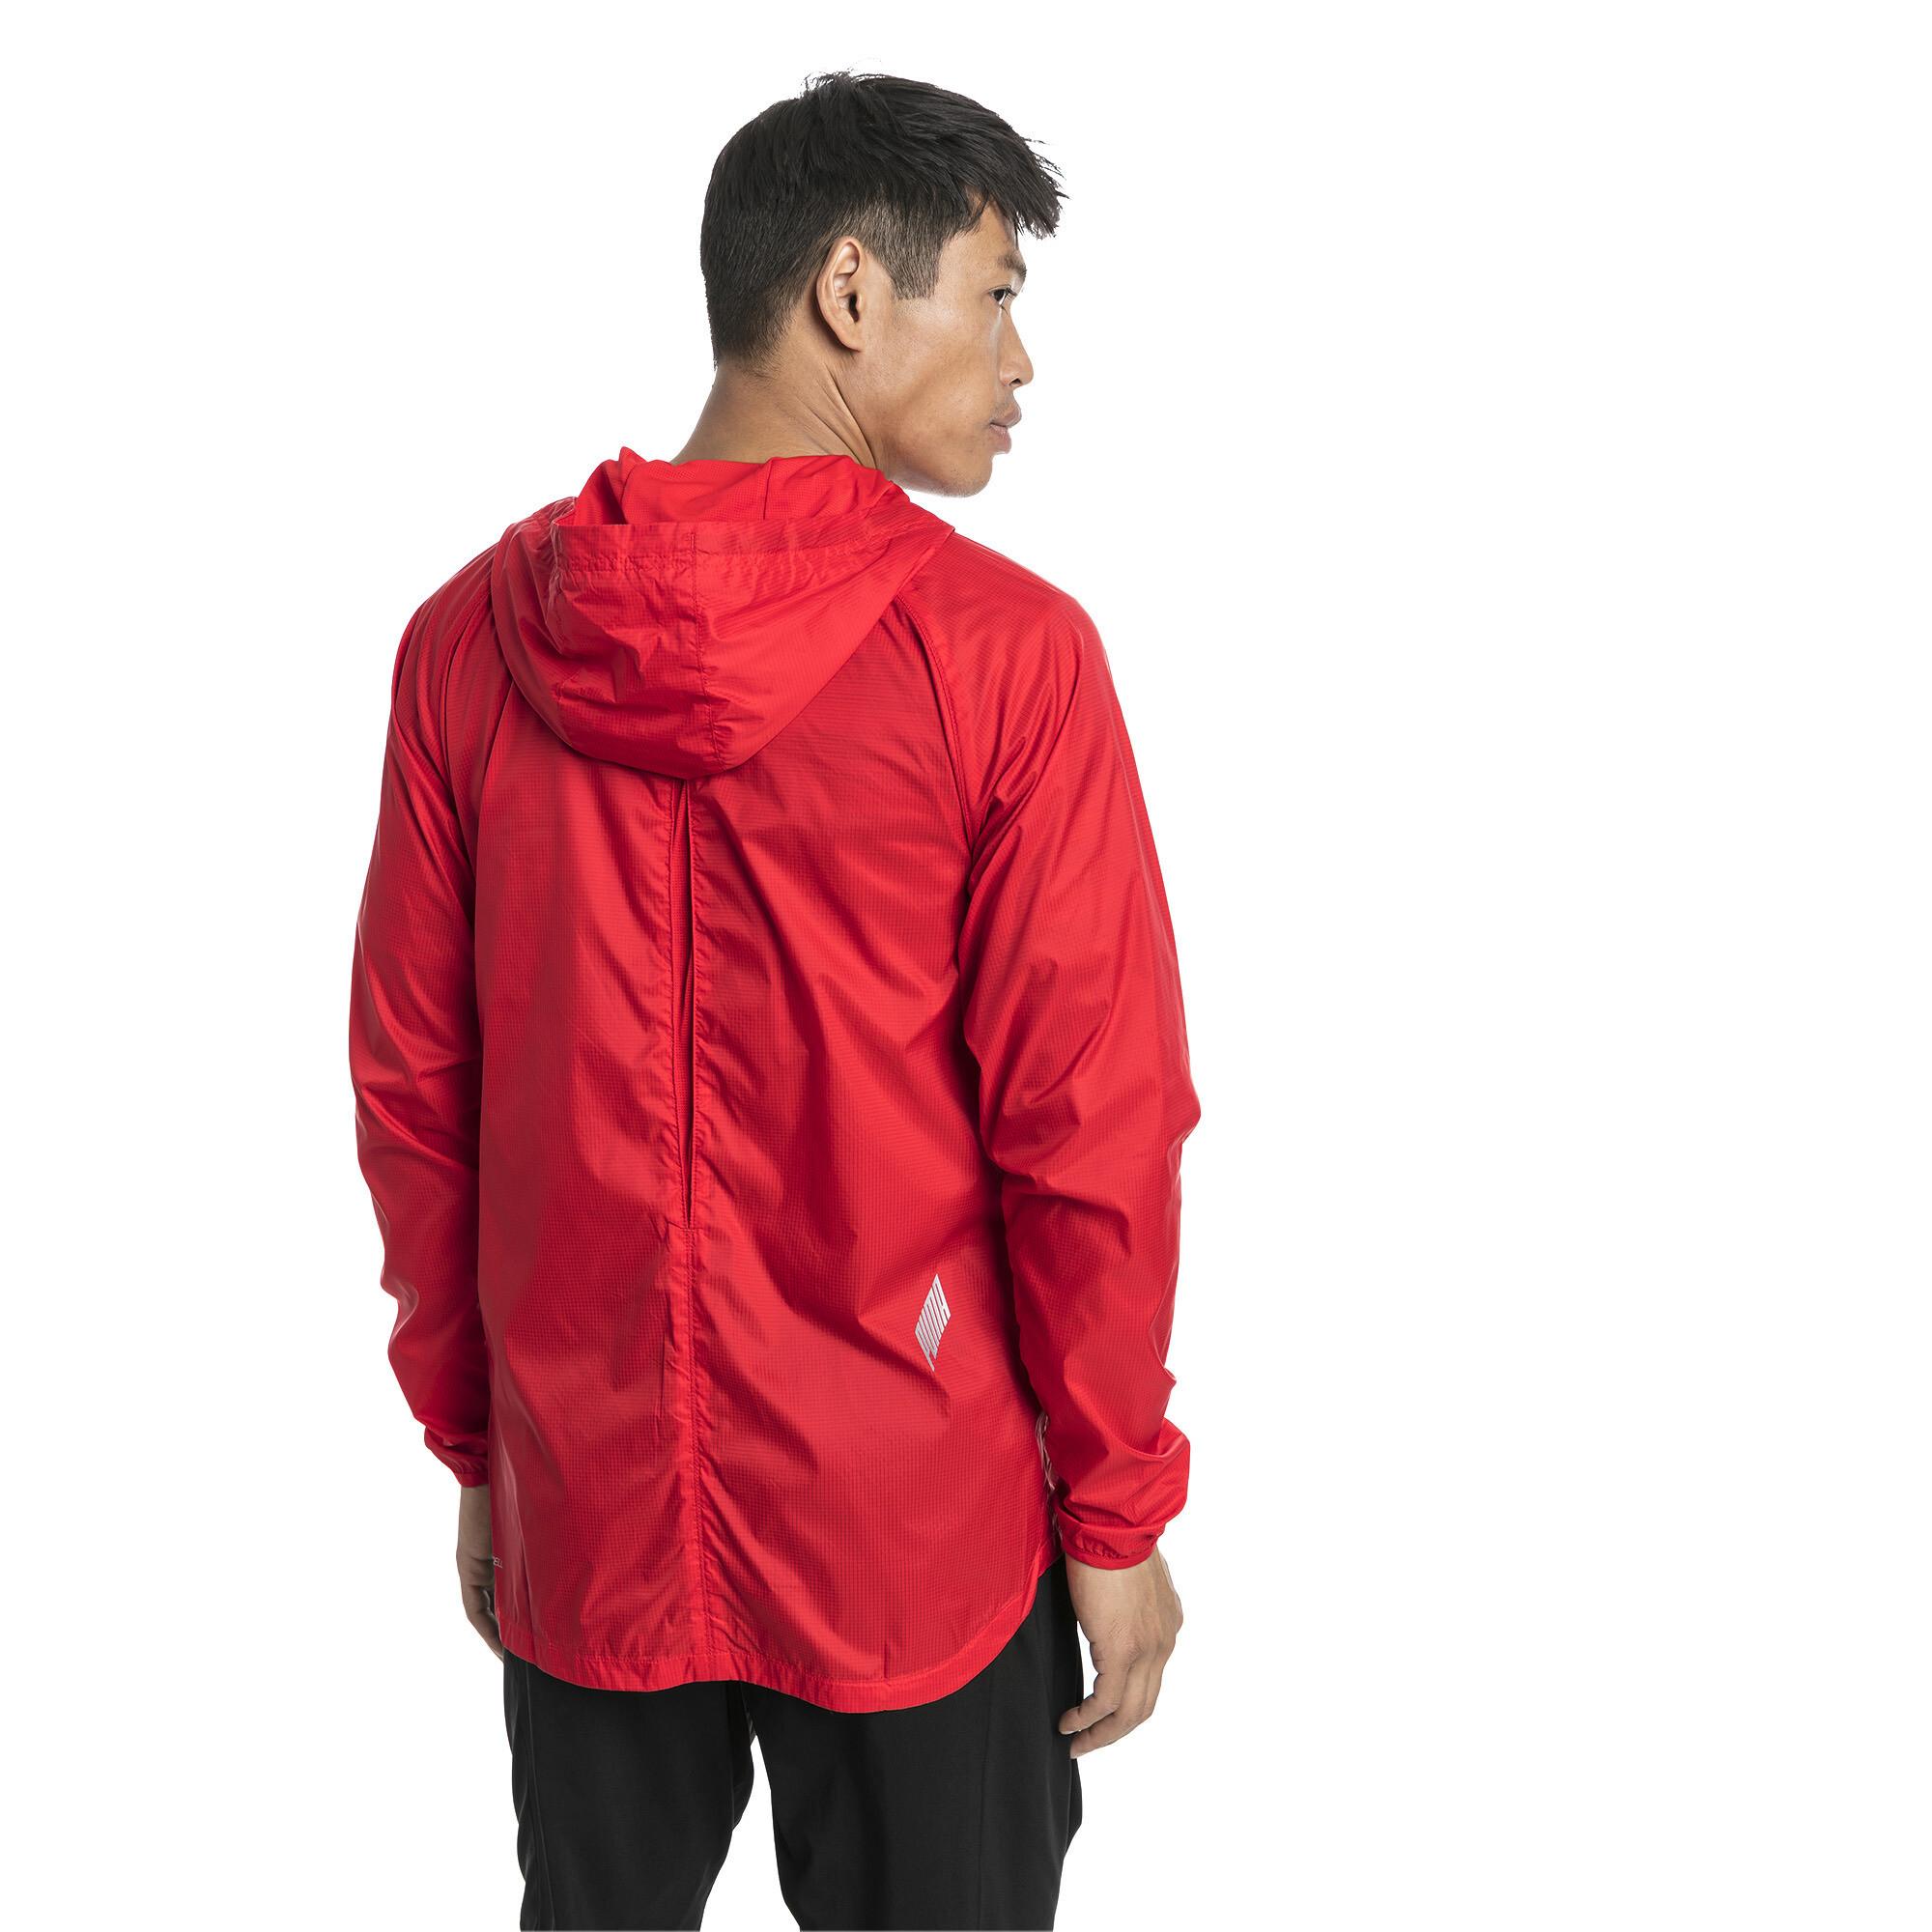 Image Puma Lightweight Full Zip Hooded Men's Jacket #2